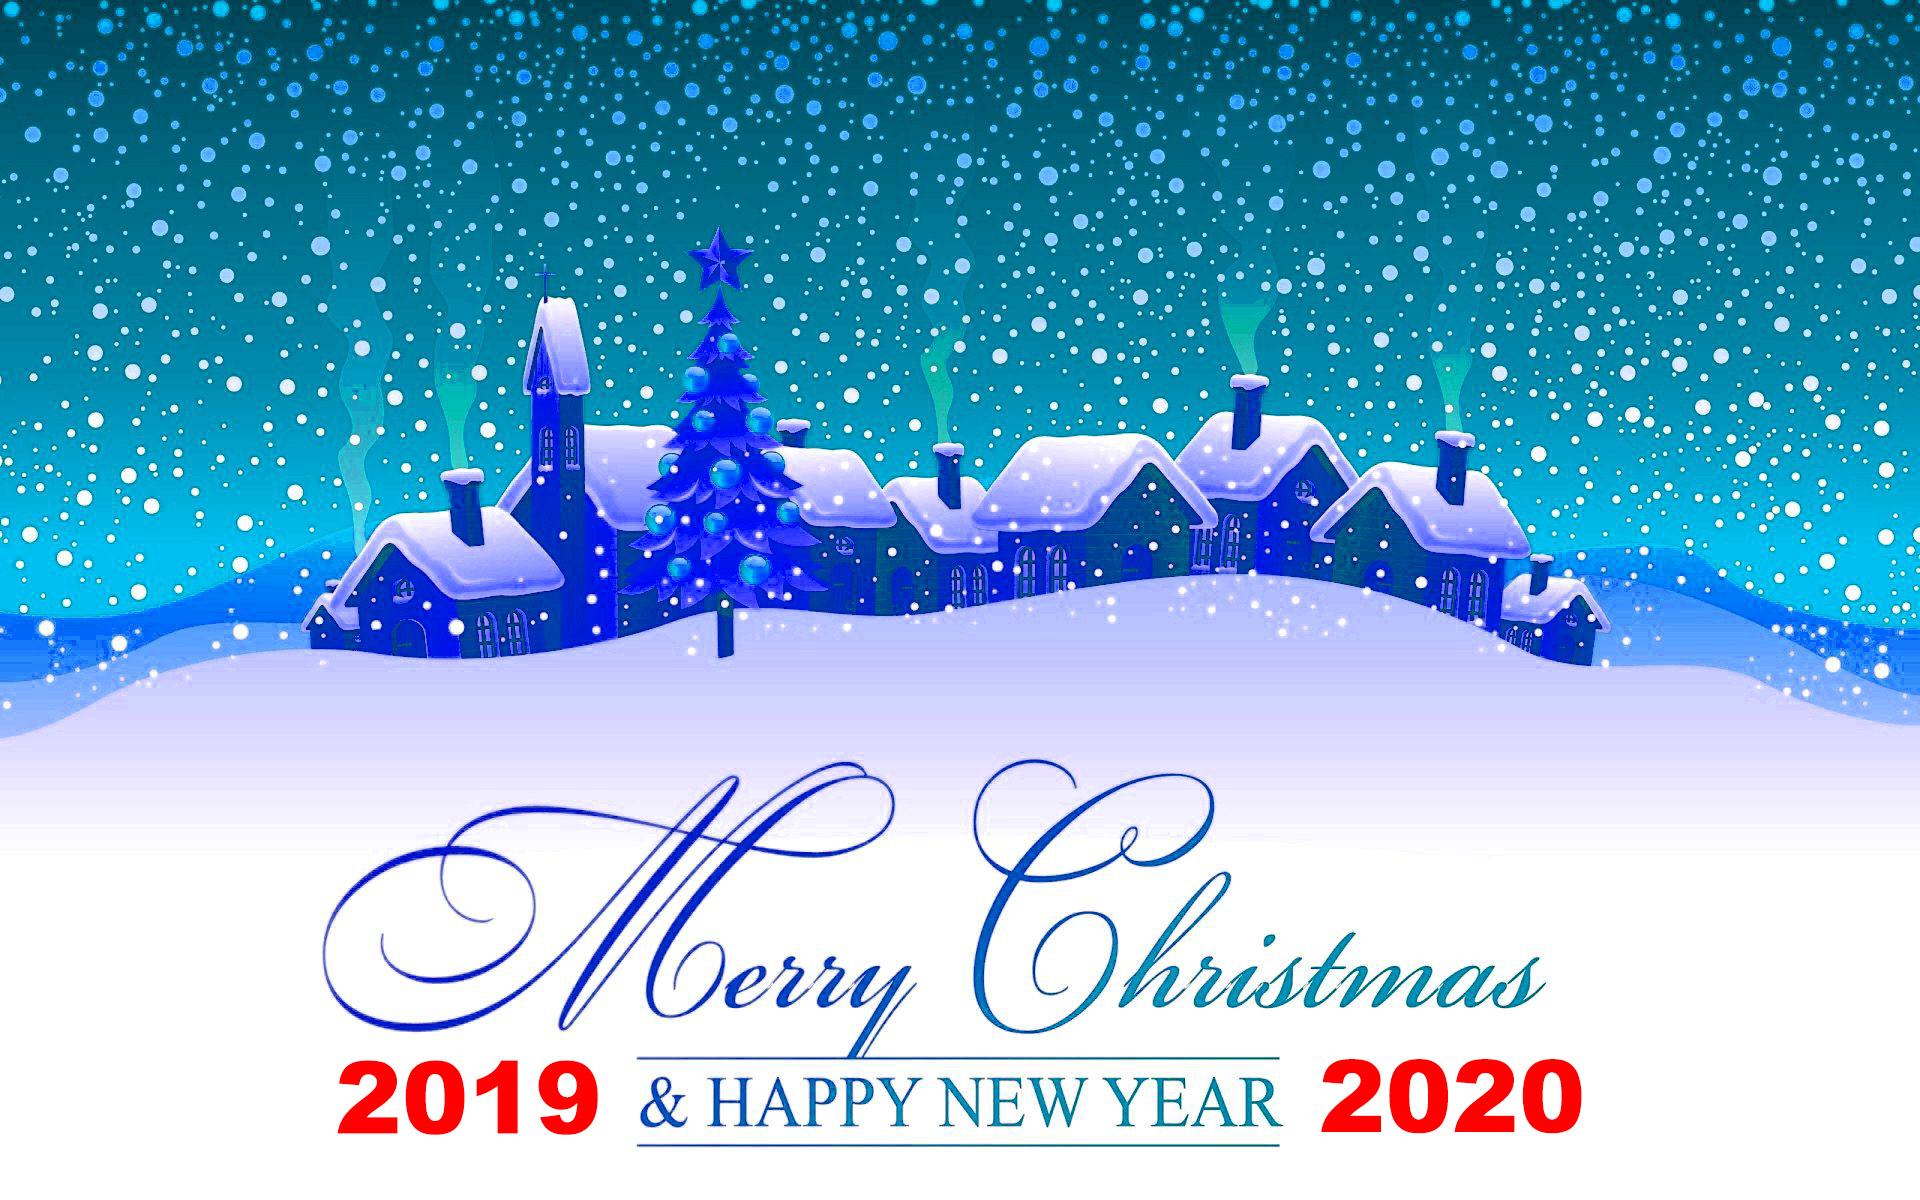 38] Happy Christmas 2020 Wallpapers on WallpaperSafari 1920x1200